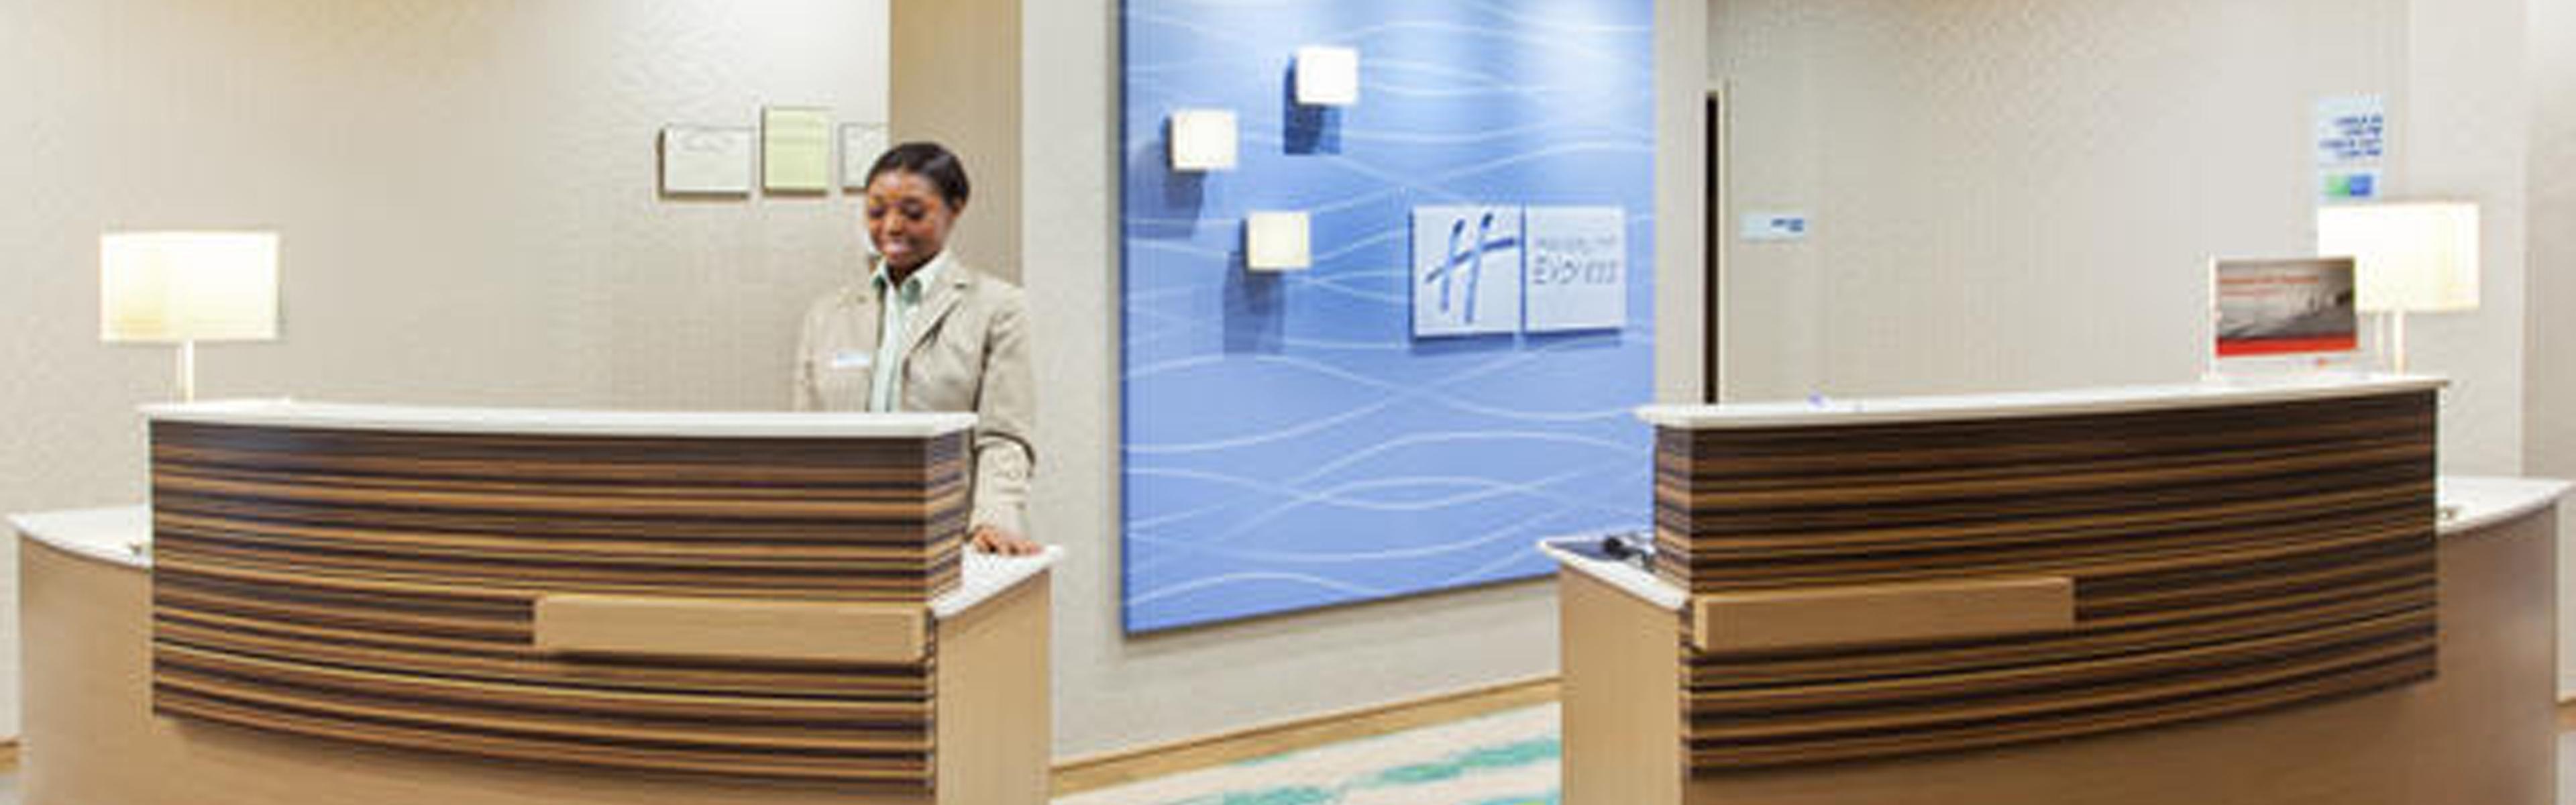 Holiday Inn Express & Suites Warner Robins North West image 0